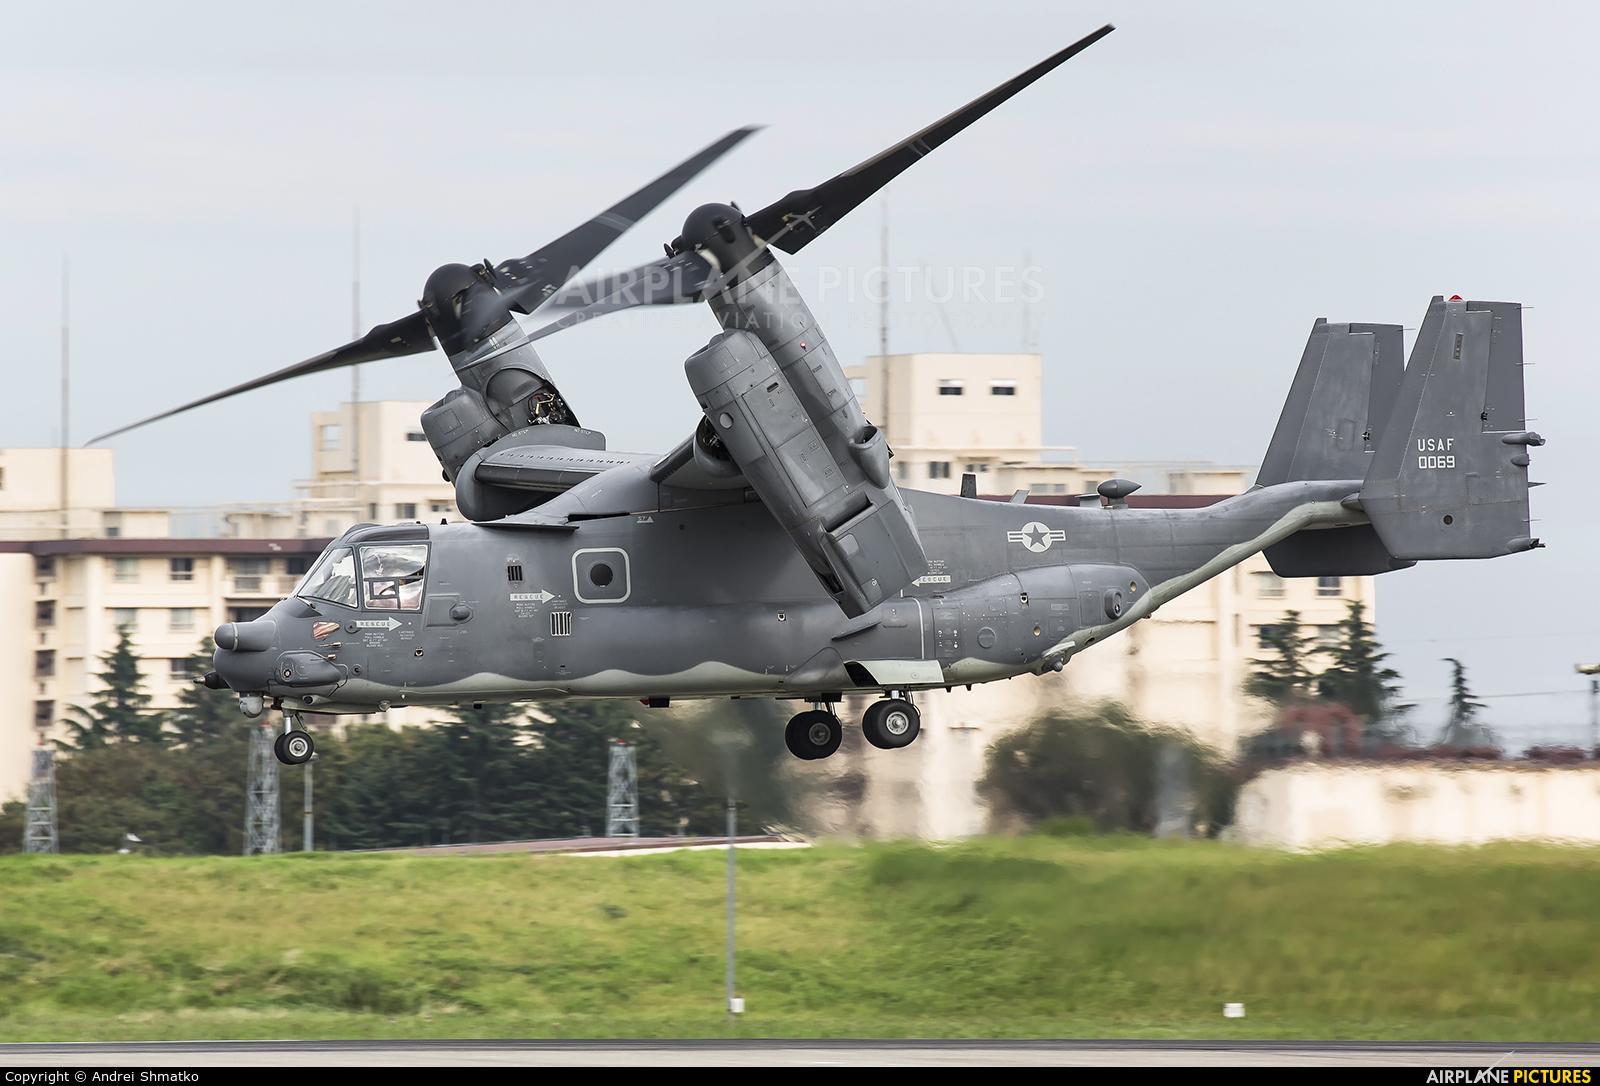 USA - Air Force 13-0069 aircraft at Yokota AB